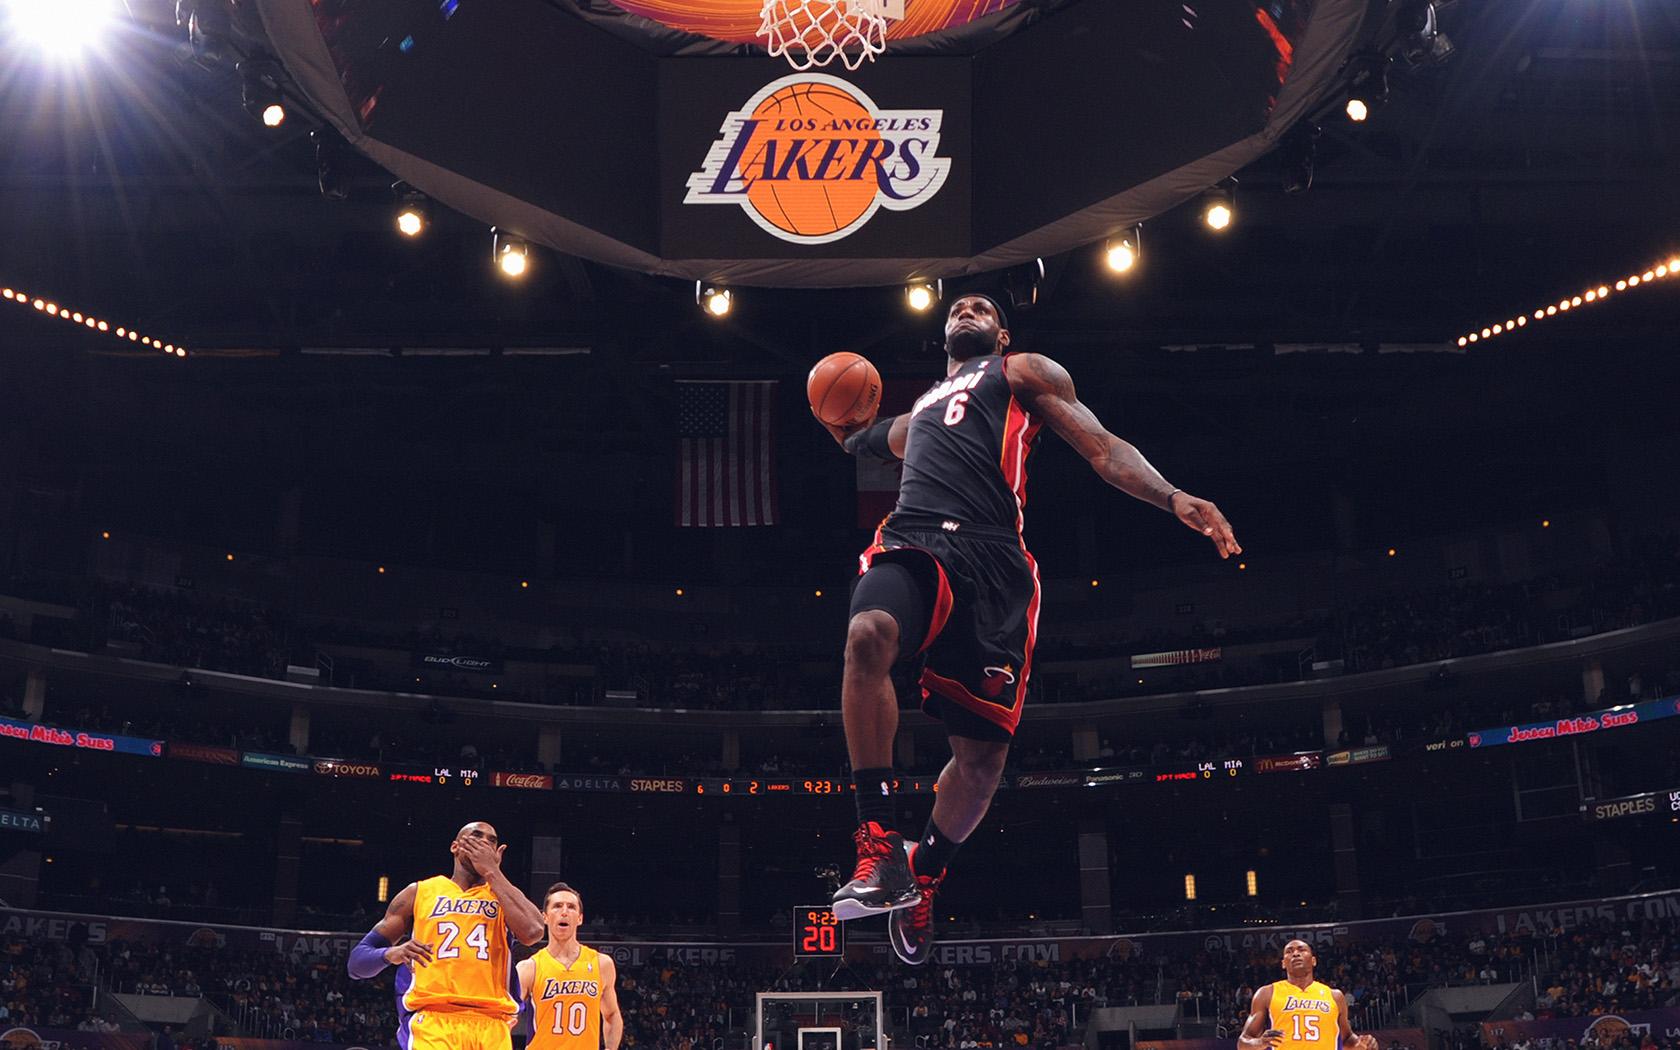 Fall Wallpapers Hi84 Lebron James Nba Basketball Dunk Wallpaper